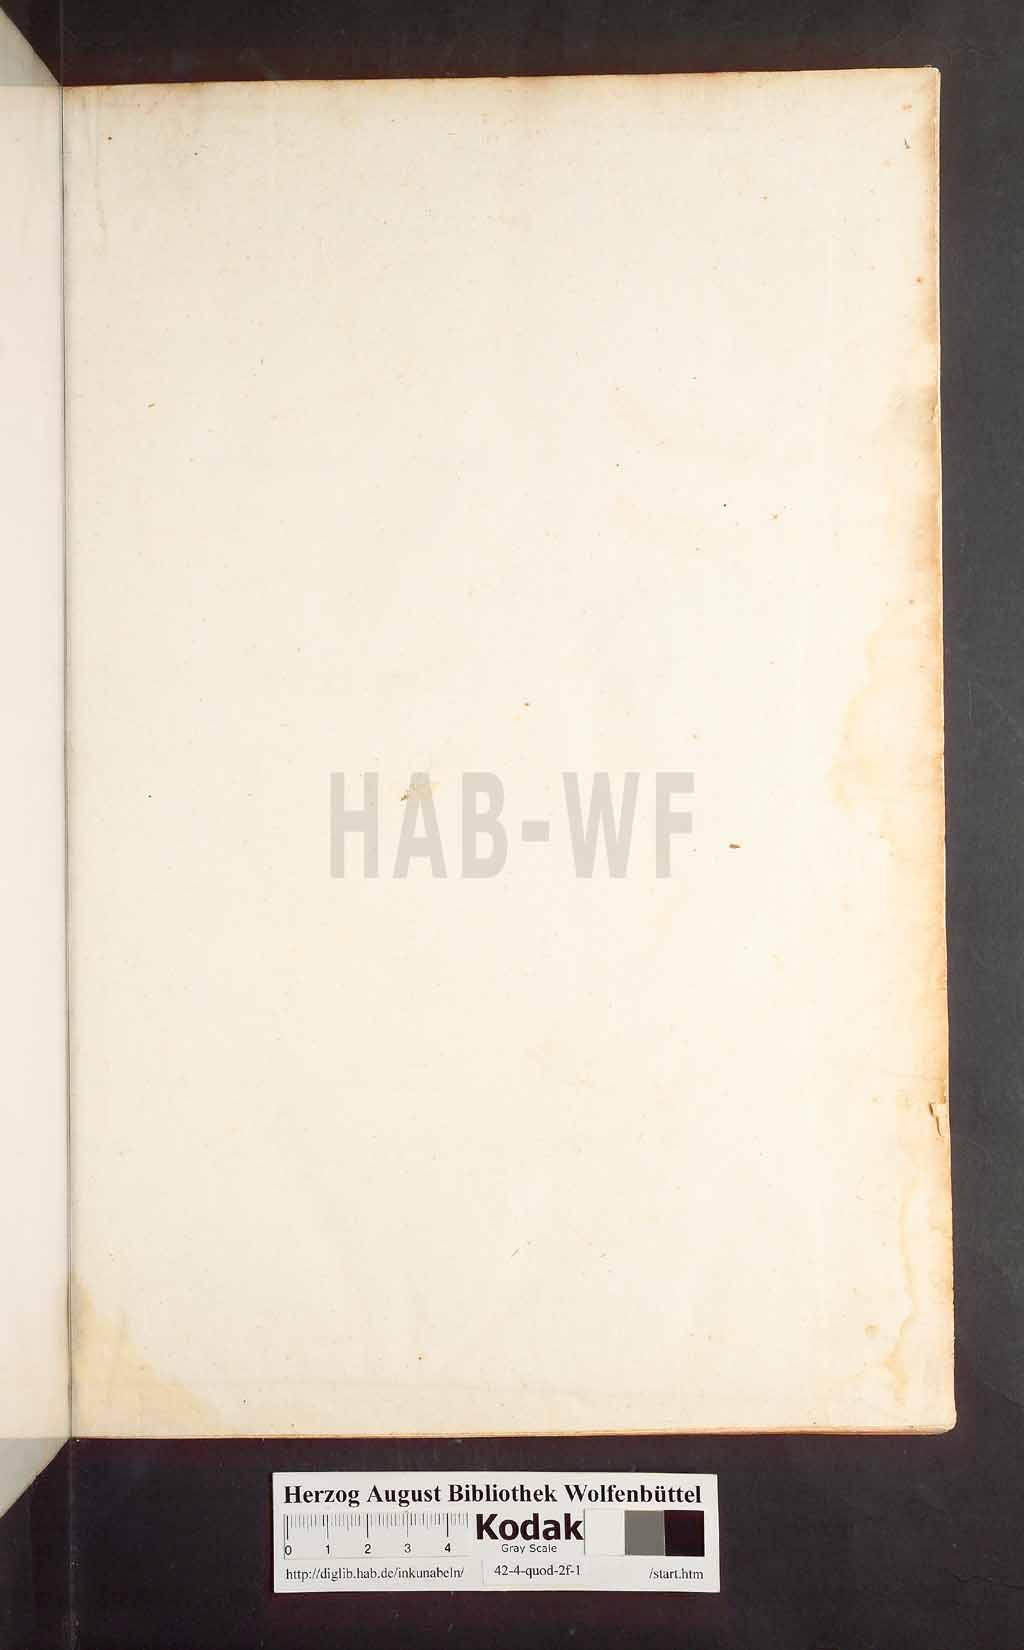 http://diglib.hab.de/inkunabeln/42-4-quod-2f-1/00001.jpg